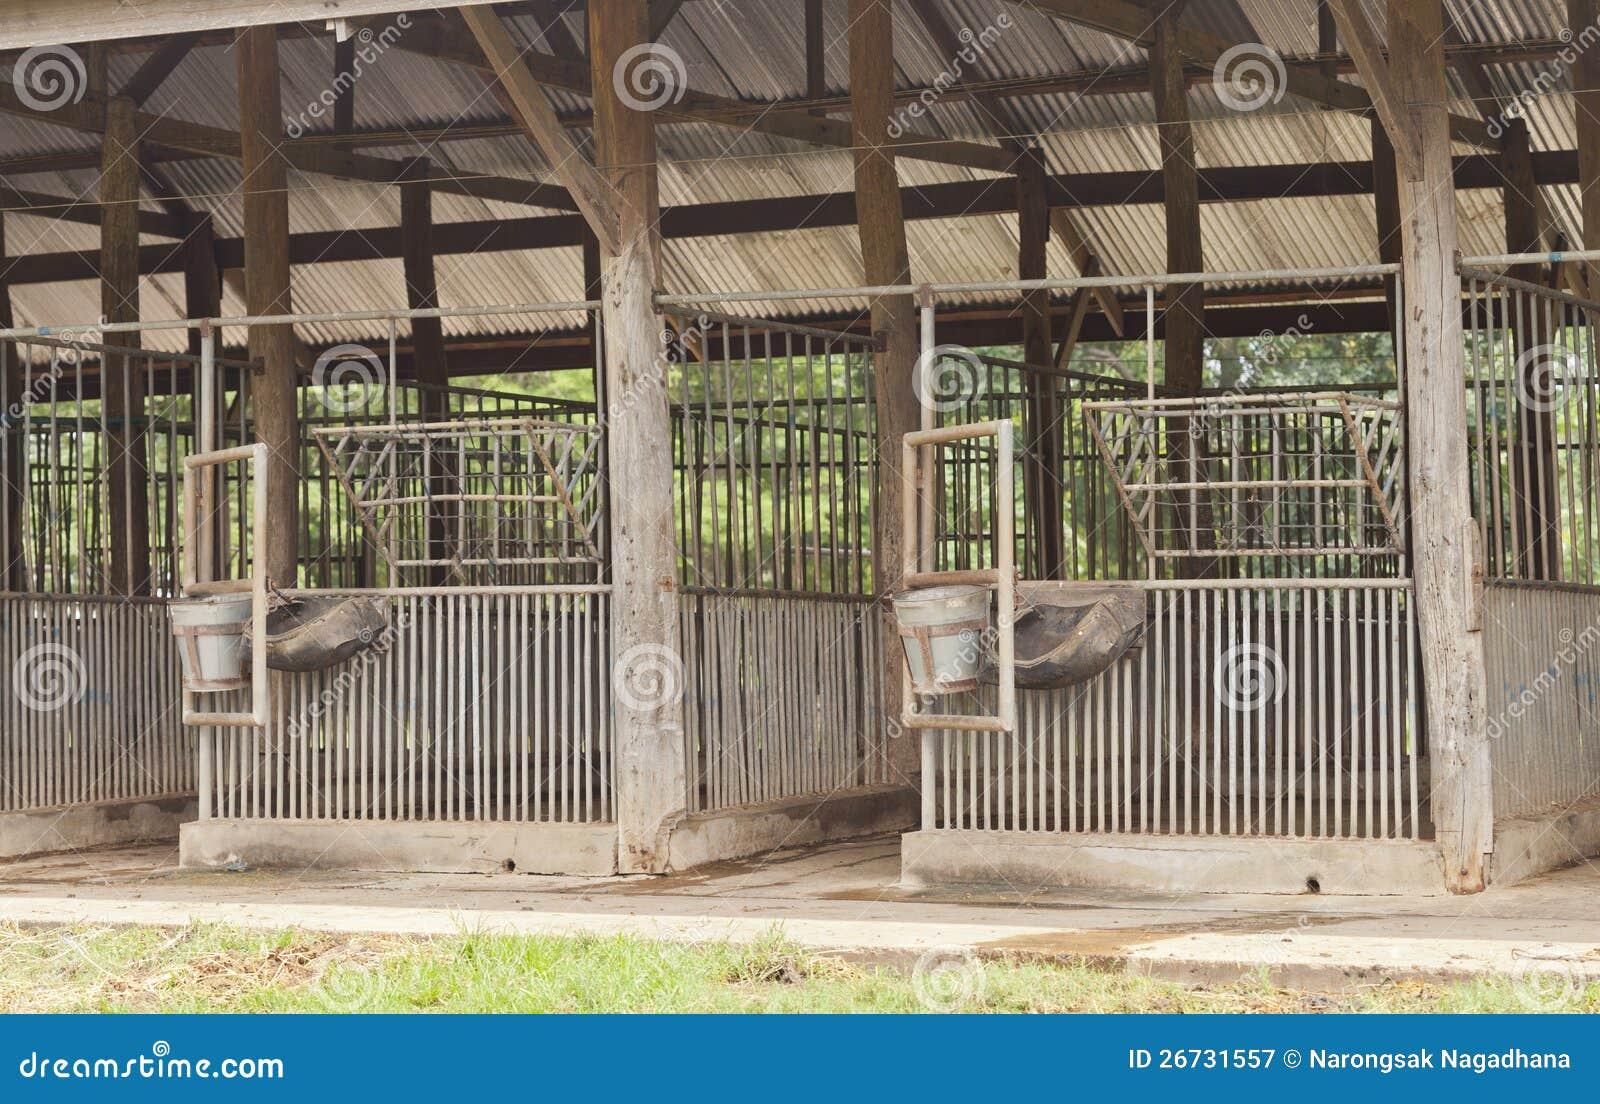 Empty Horse Barn Royalty Free Stock Photography Image